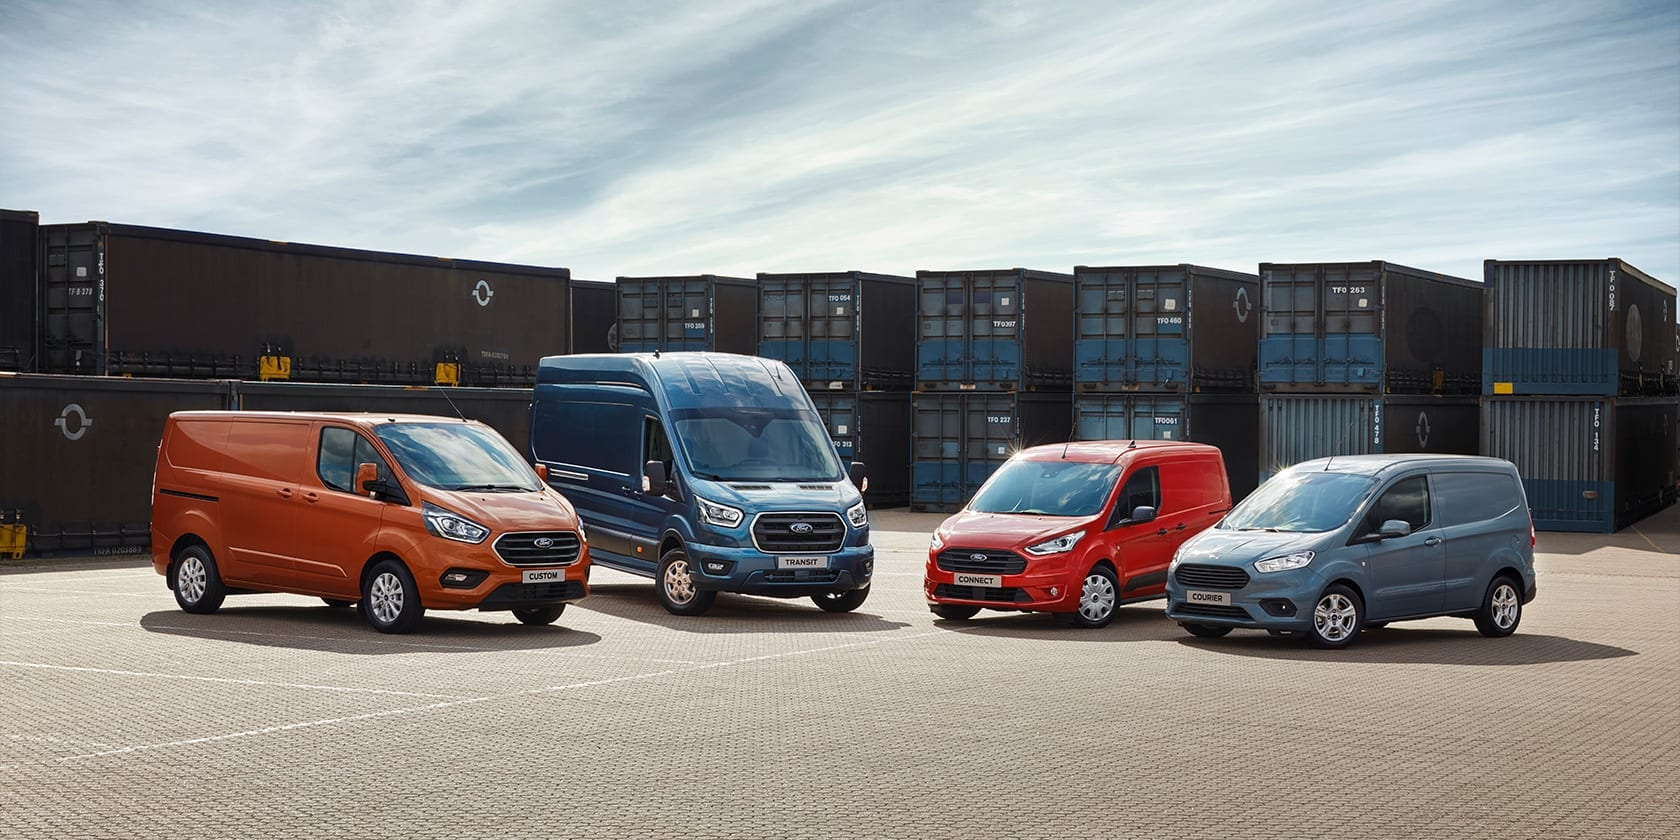 ford-bedrijfswagens-2x